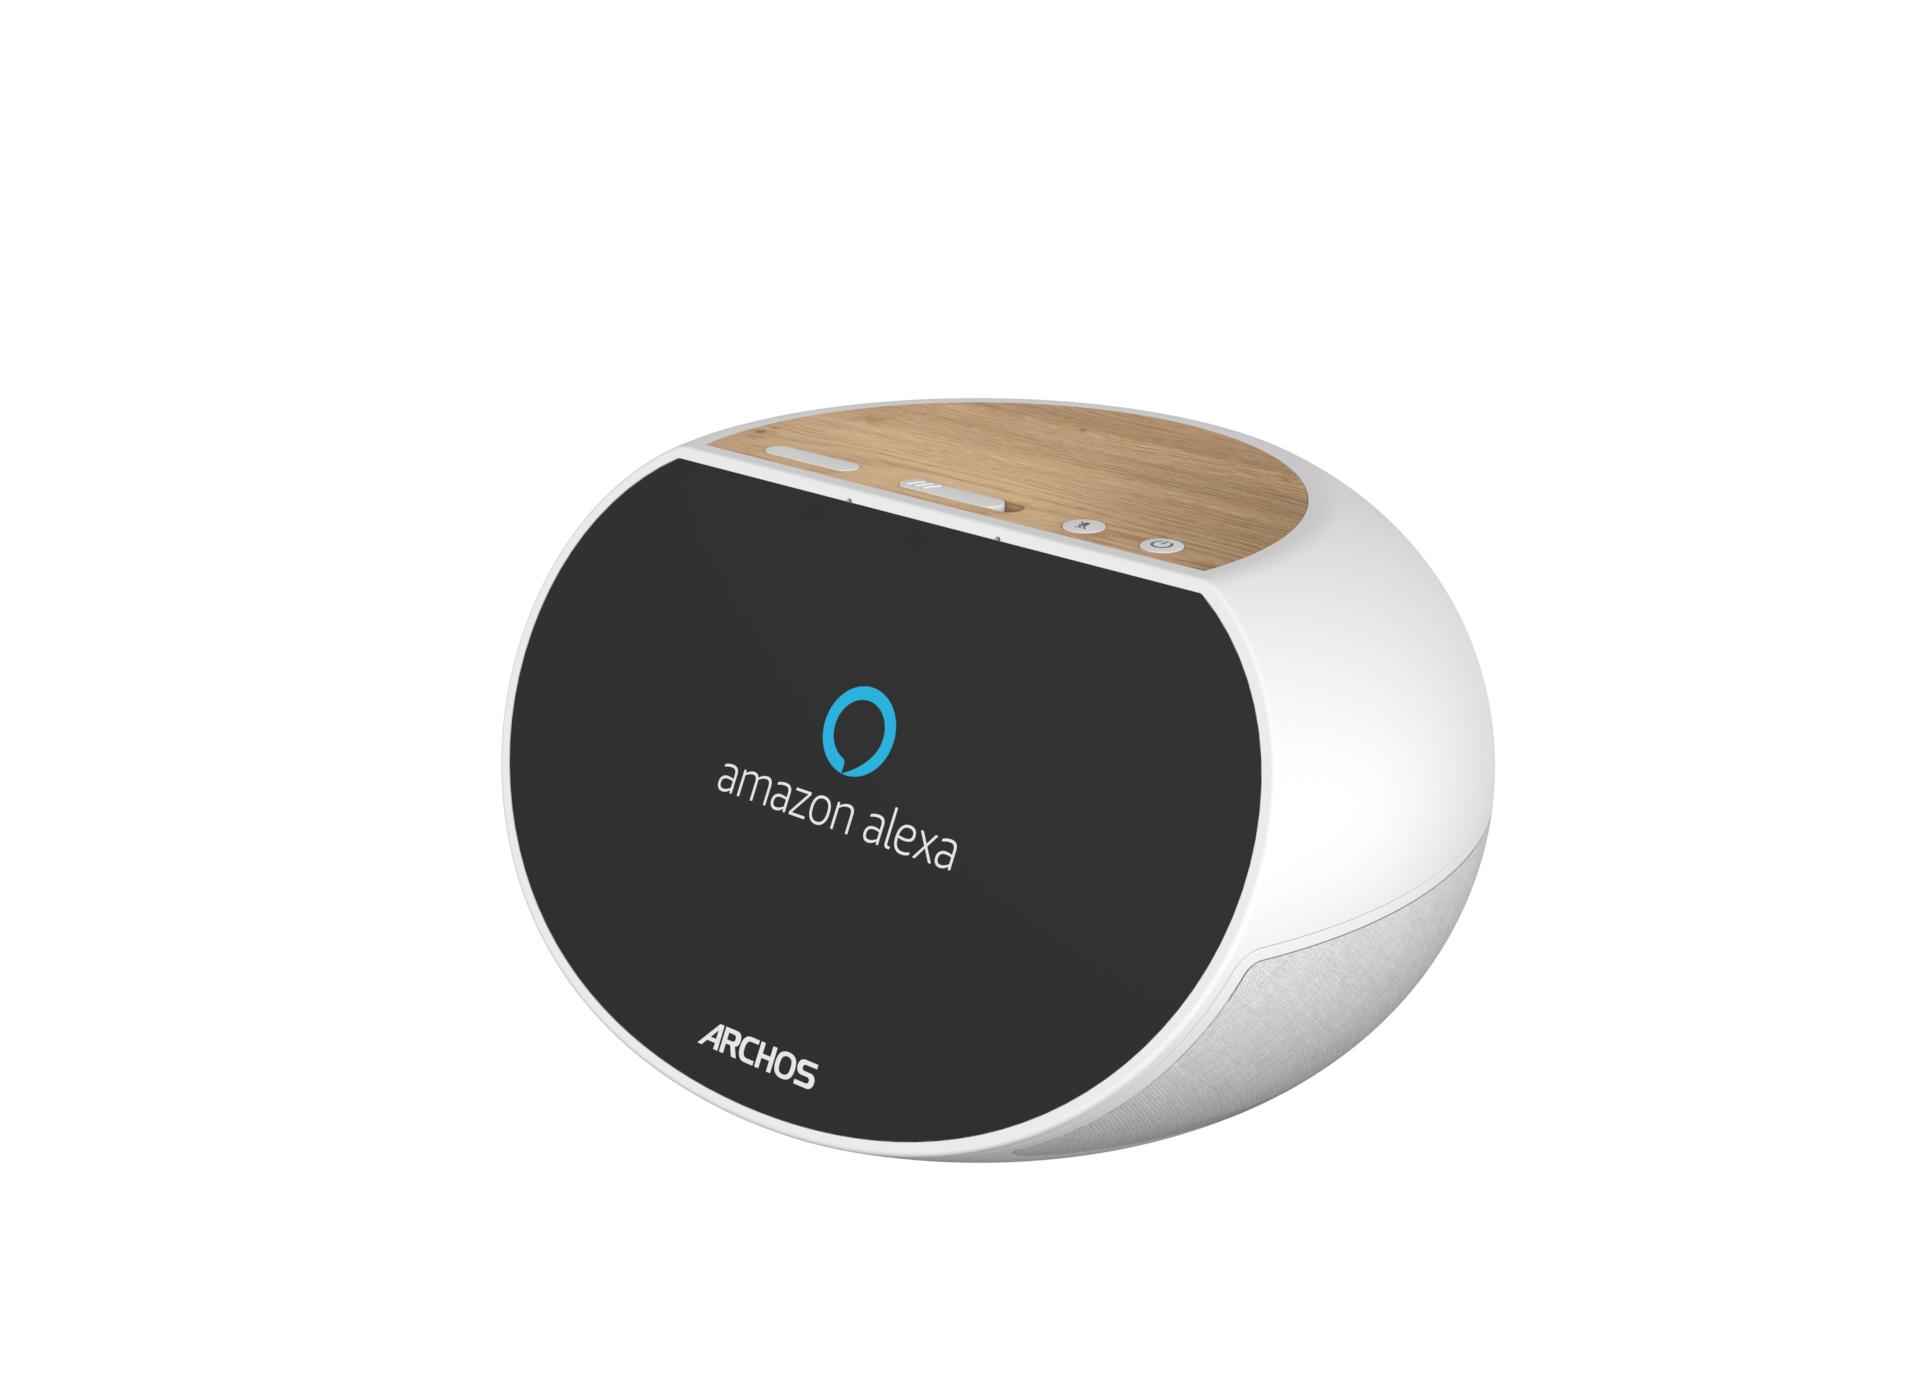 archos-mate-smart-display-amazon-alexa-02